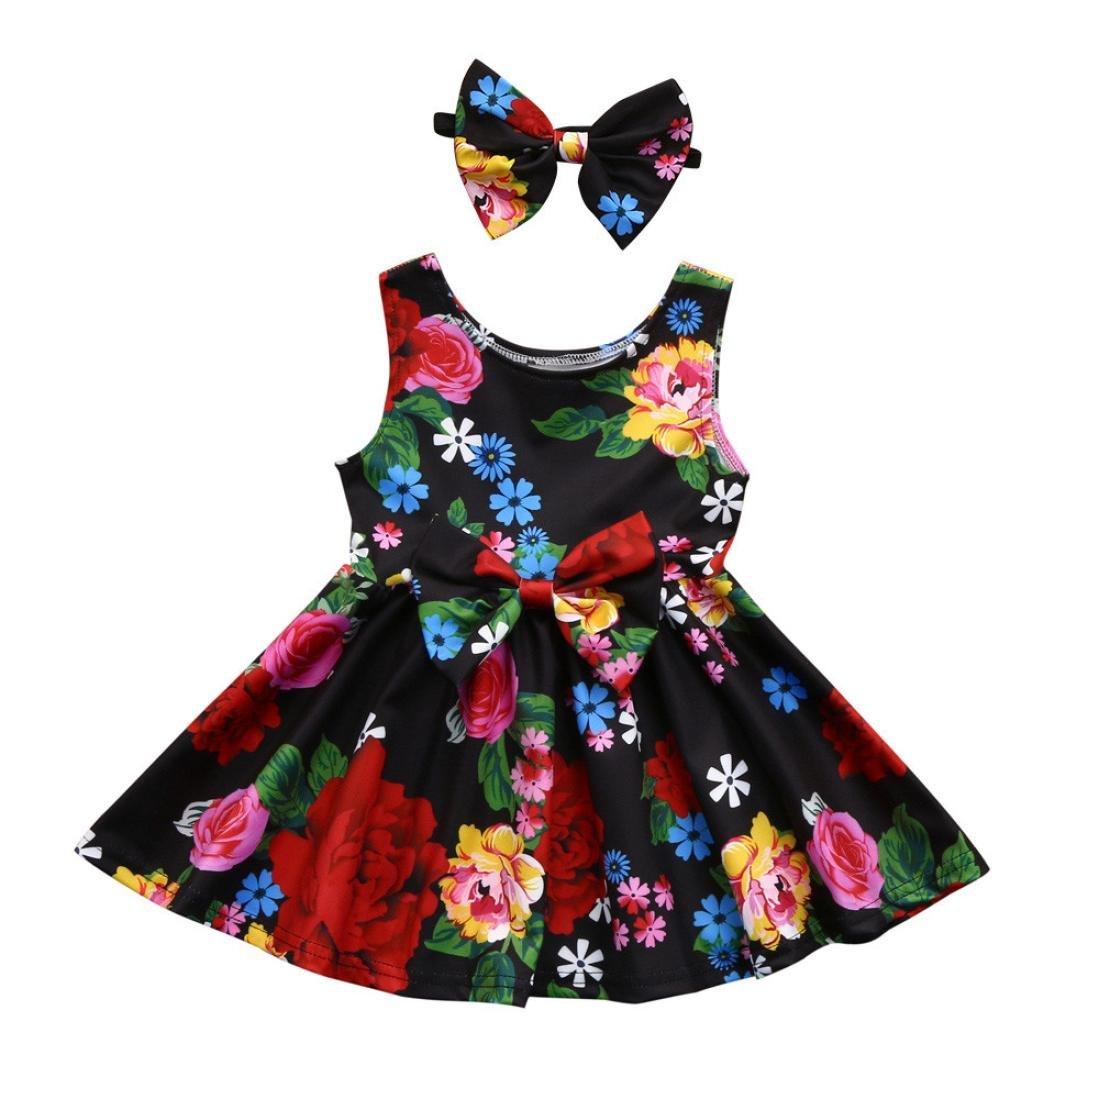 c58433d063b Amazon.com  Toraway Baby Girls Dresses Summer Dress Sleeveless Floral Bowknot  Princess Party A-Line Dresses + 1PC Headband Outfits  Clothing